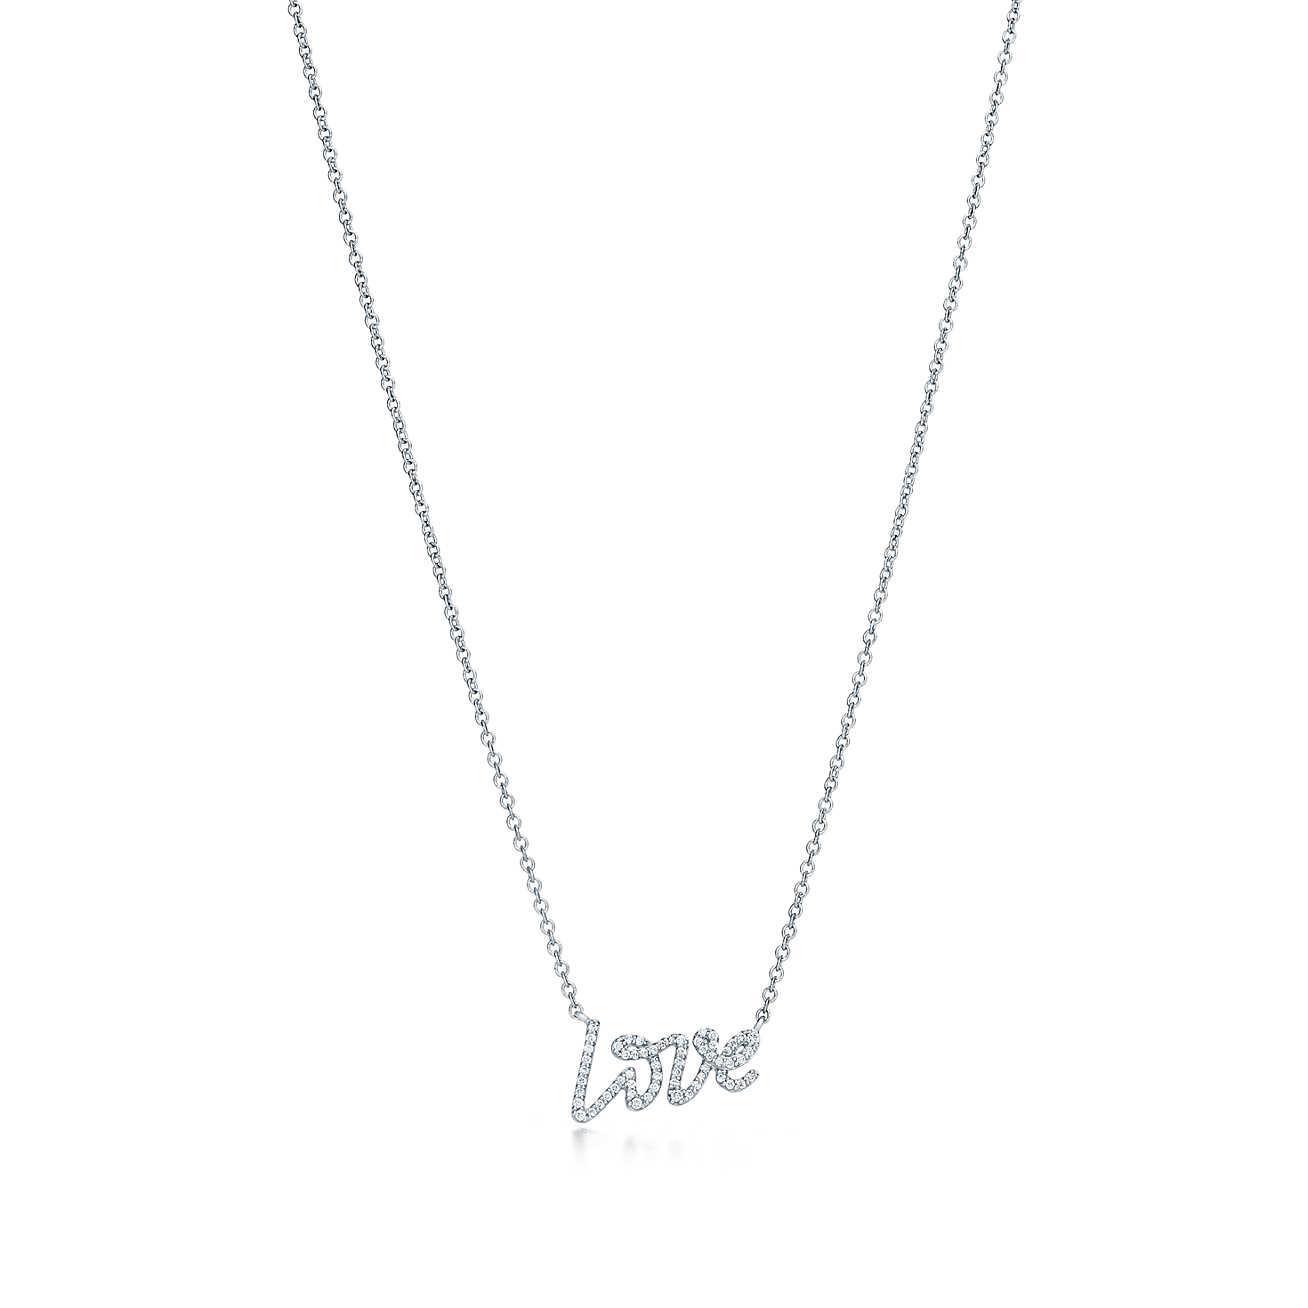 b04276d09ecf Tiffany   Co. Paloma s Graffiti Love Pendant In 18k White Gold With ...